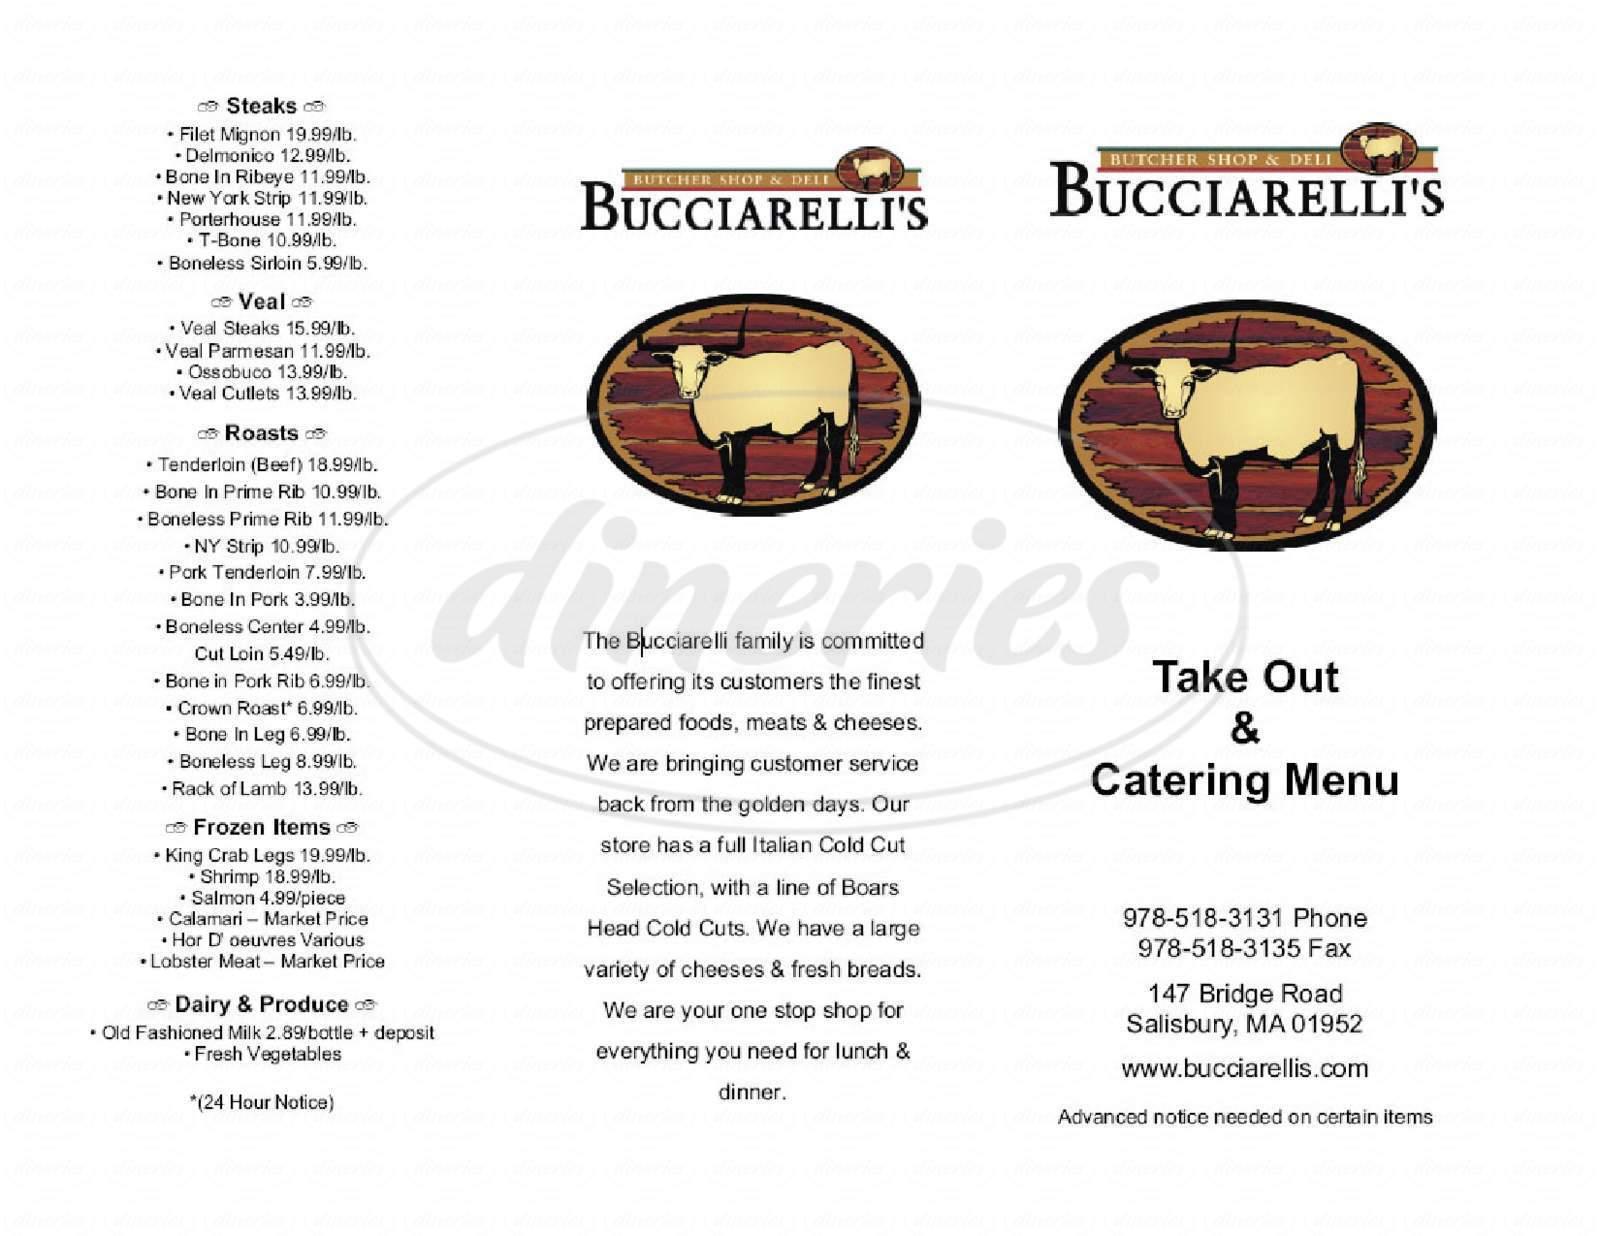 menu for Bucciarellis